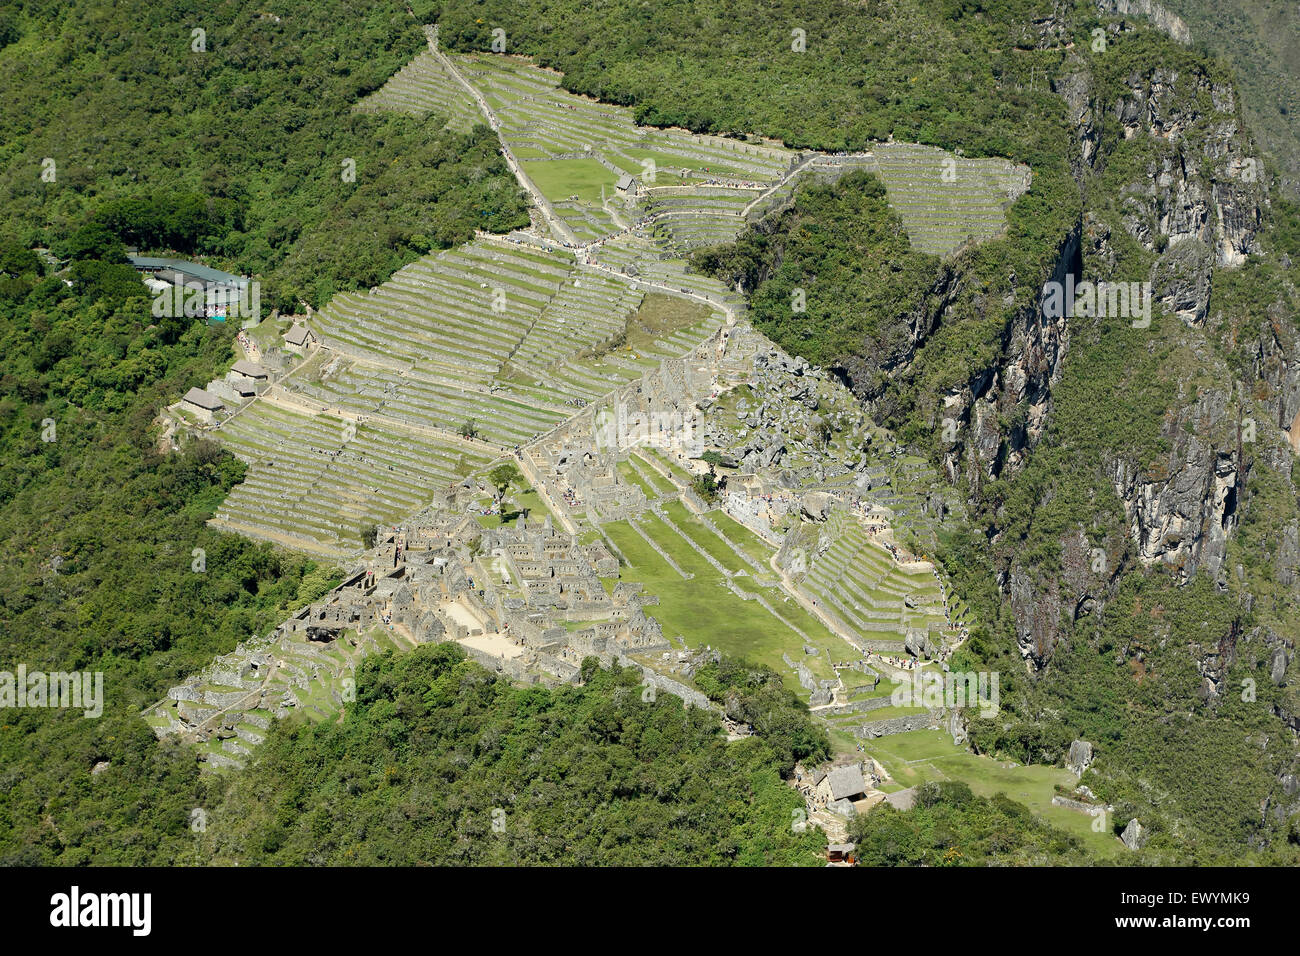 Mountain living near cusco peru royalty free stock photo - Machu Picchu Inca Ruins From Huayna Picchu Mountain Near Machu Picchu Pueblo Aka Aguas Calientes Cusco Peru